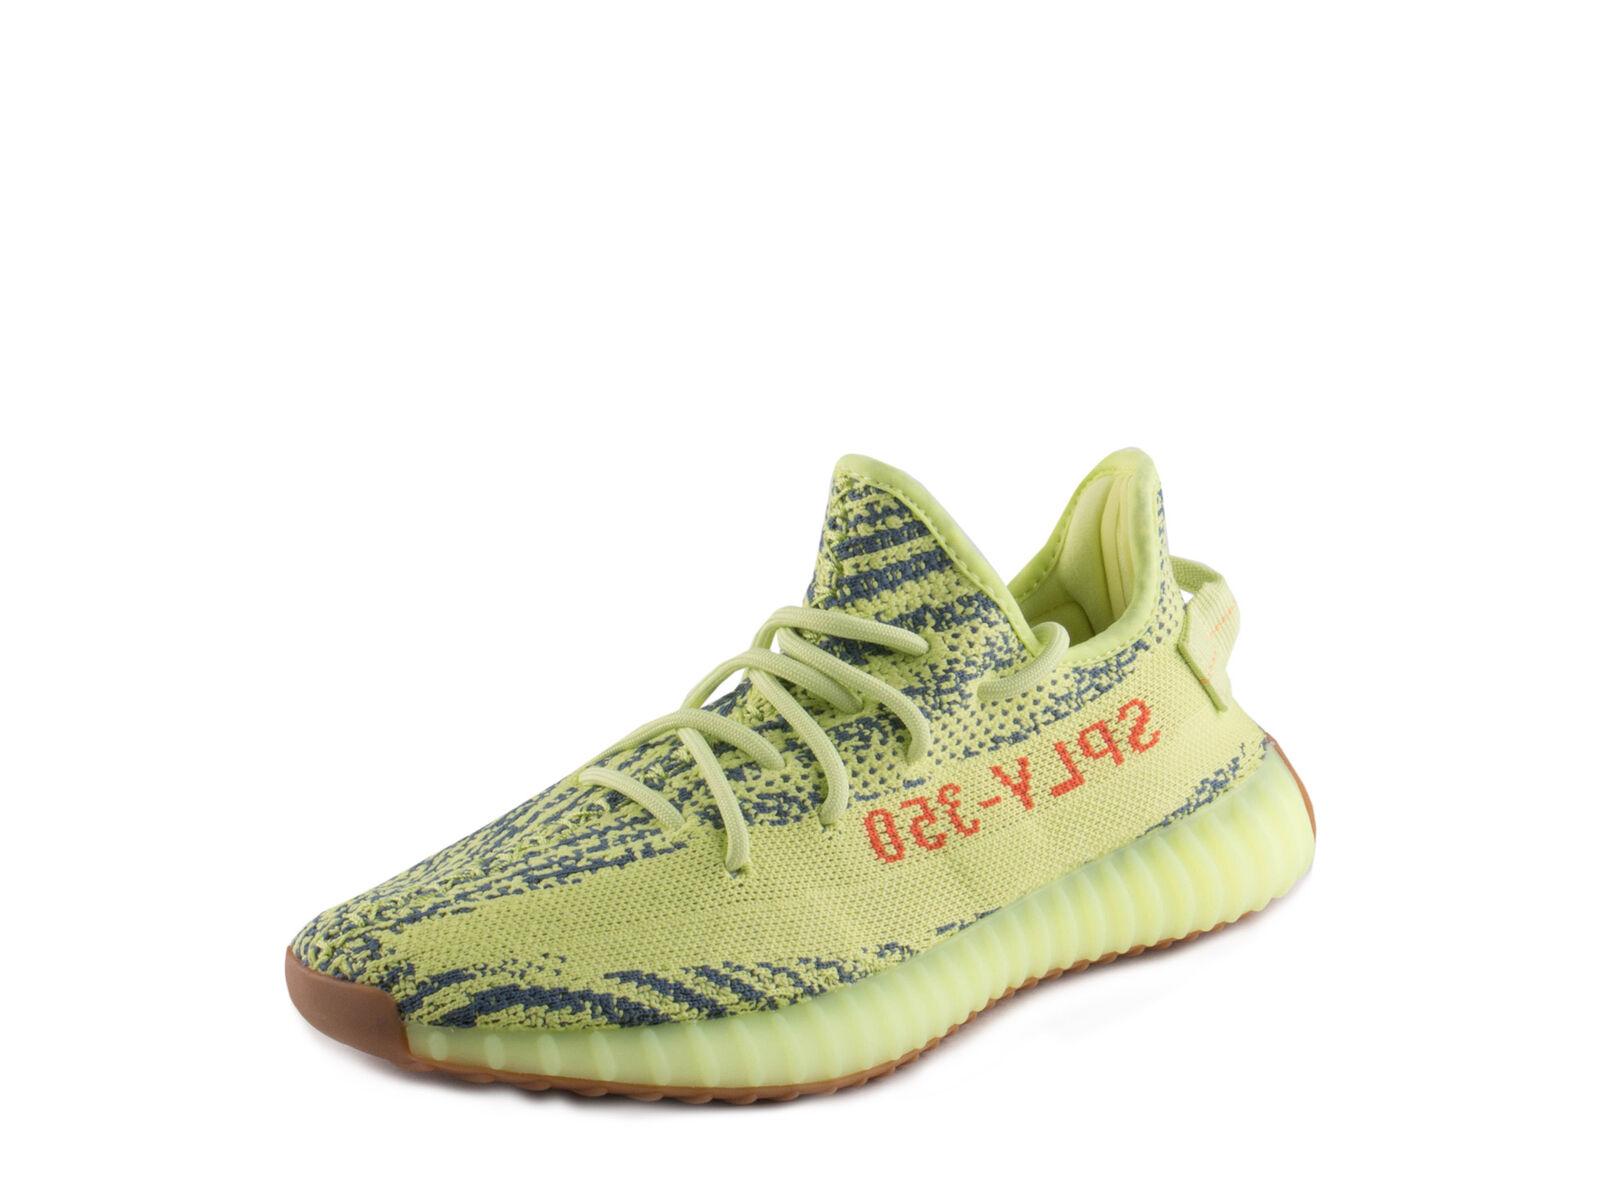 Adidas Mens Yeezy Boost 350 V2  Frozen Yellow  Frozen Yellow B37572